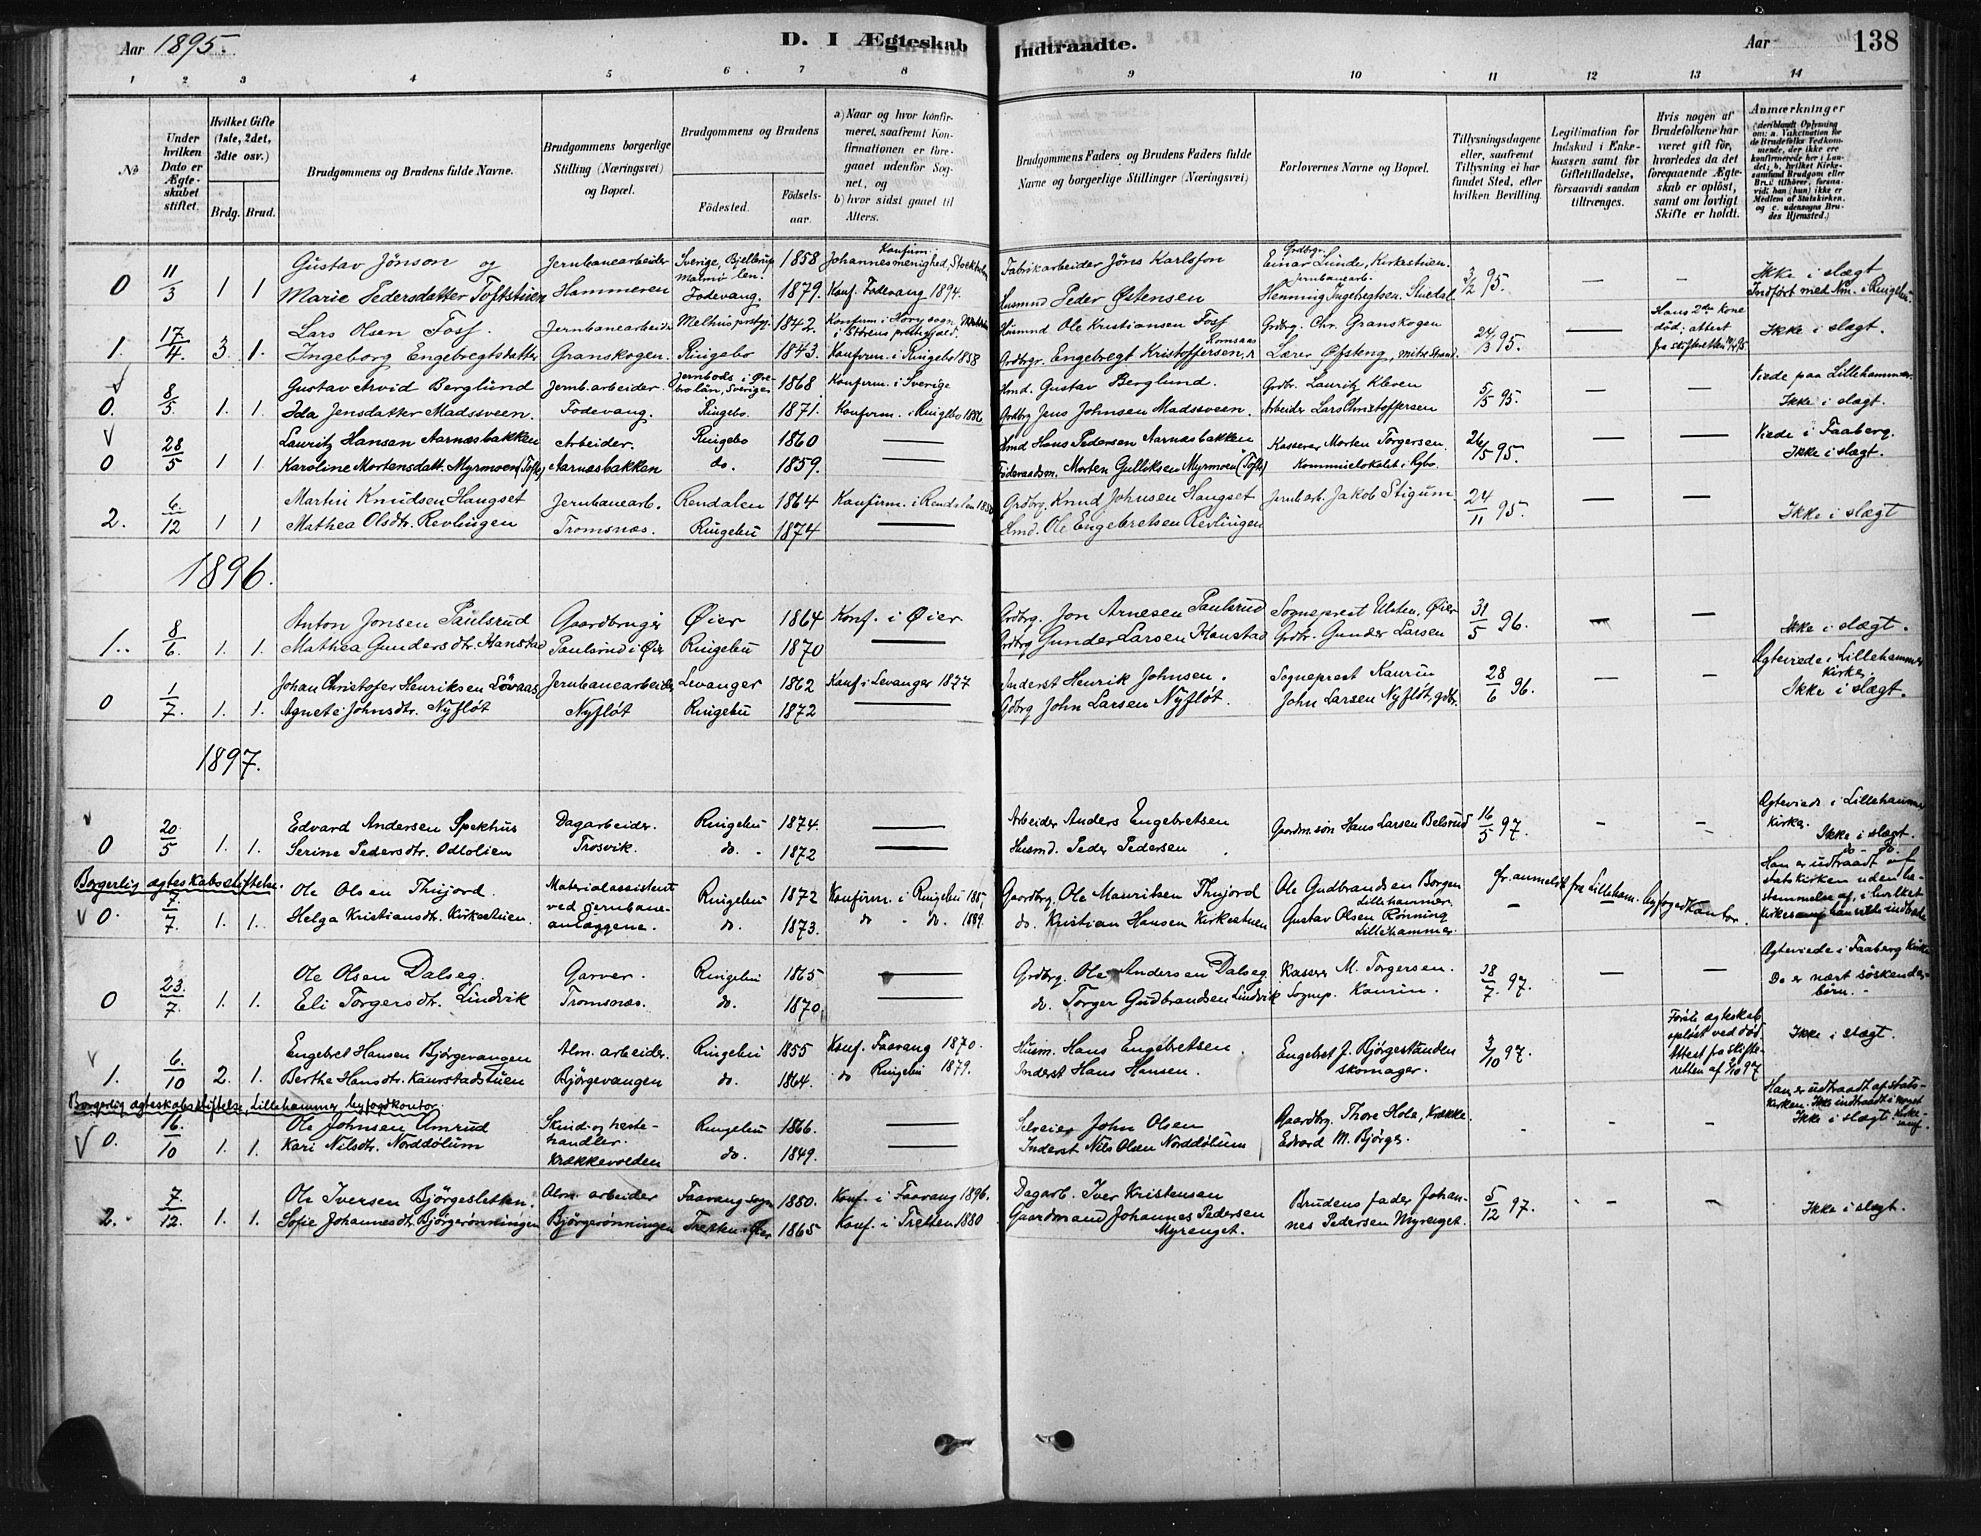 SAH, Ringebu prestekontor, Ministerialbok nr. 9, 1878-1898, s. 138